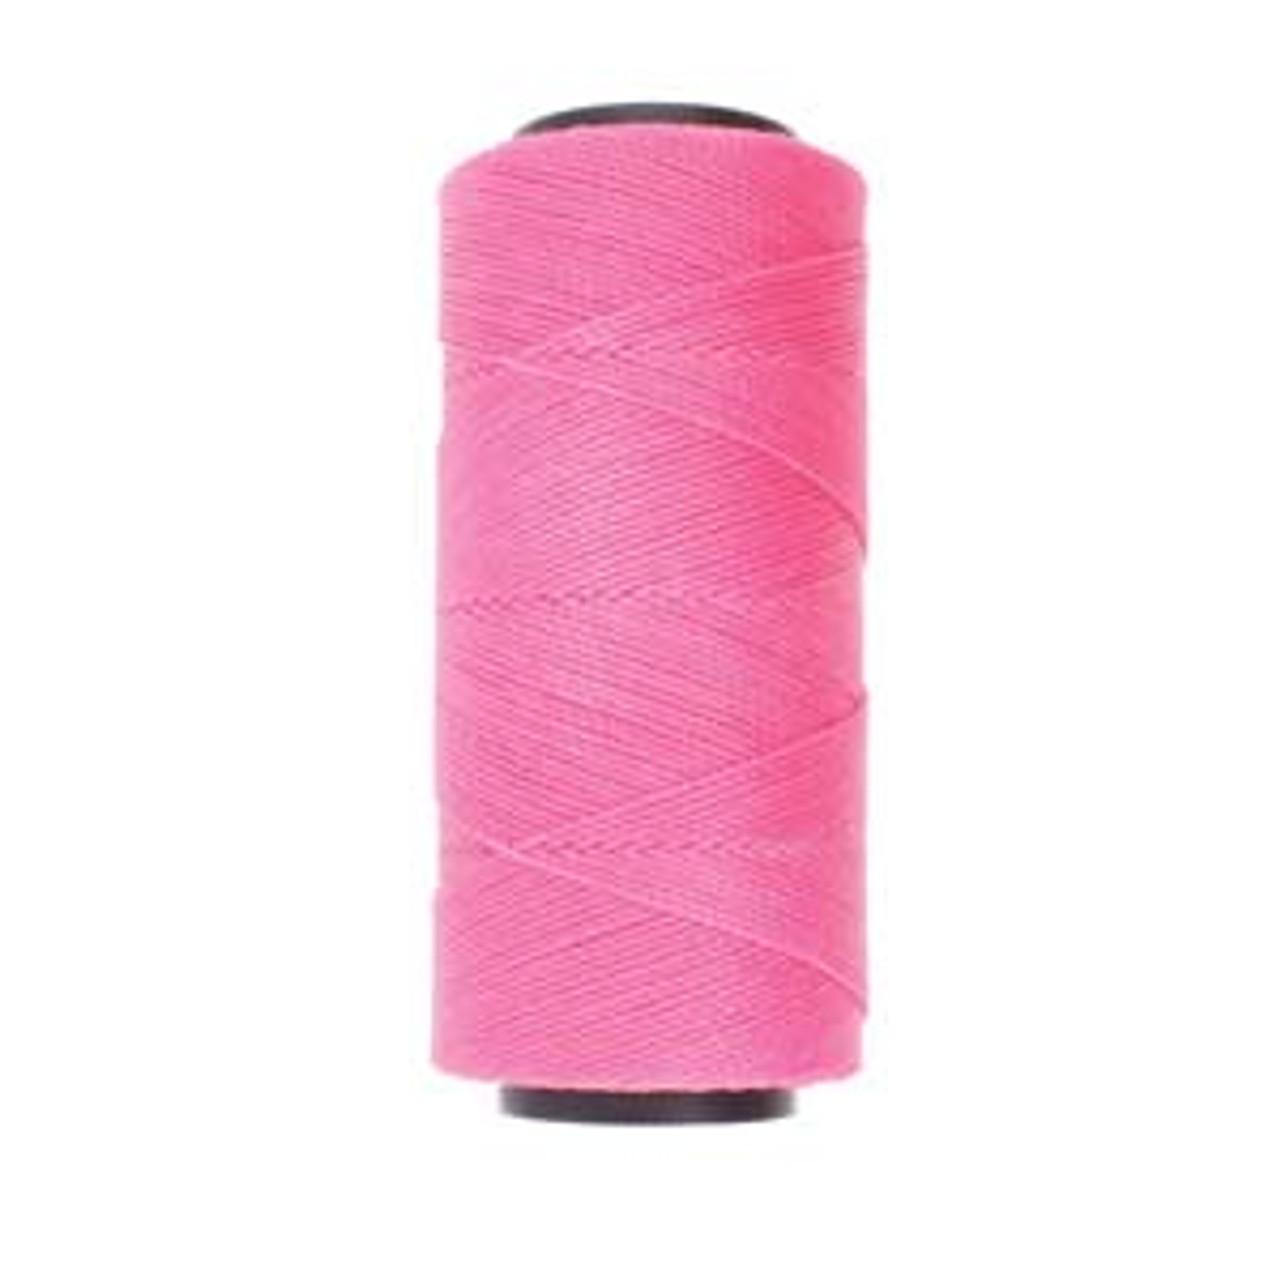 144yds 2 ply Pink Waxed Brazilian Cord